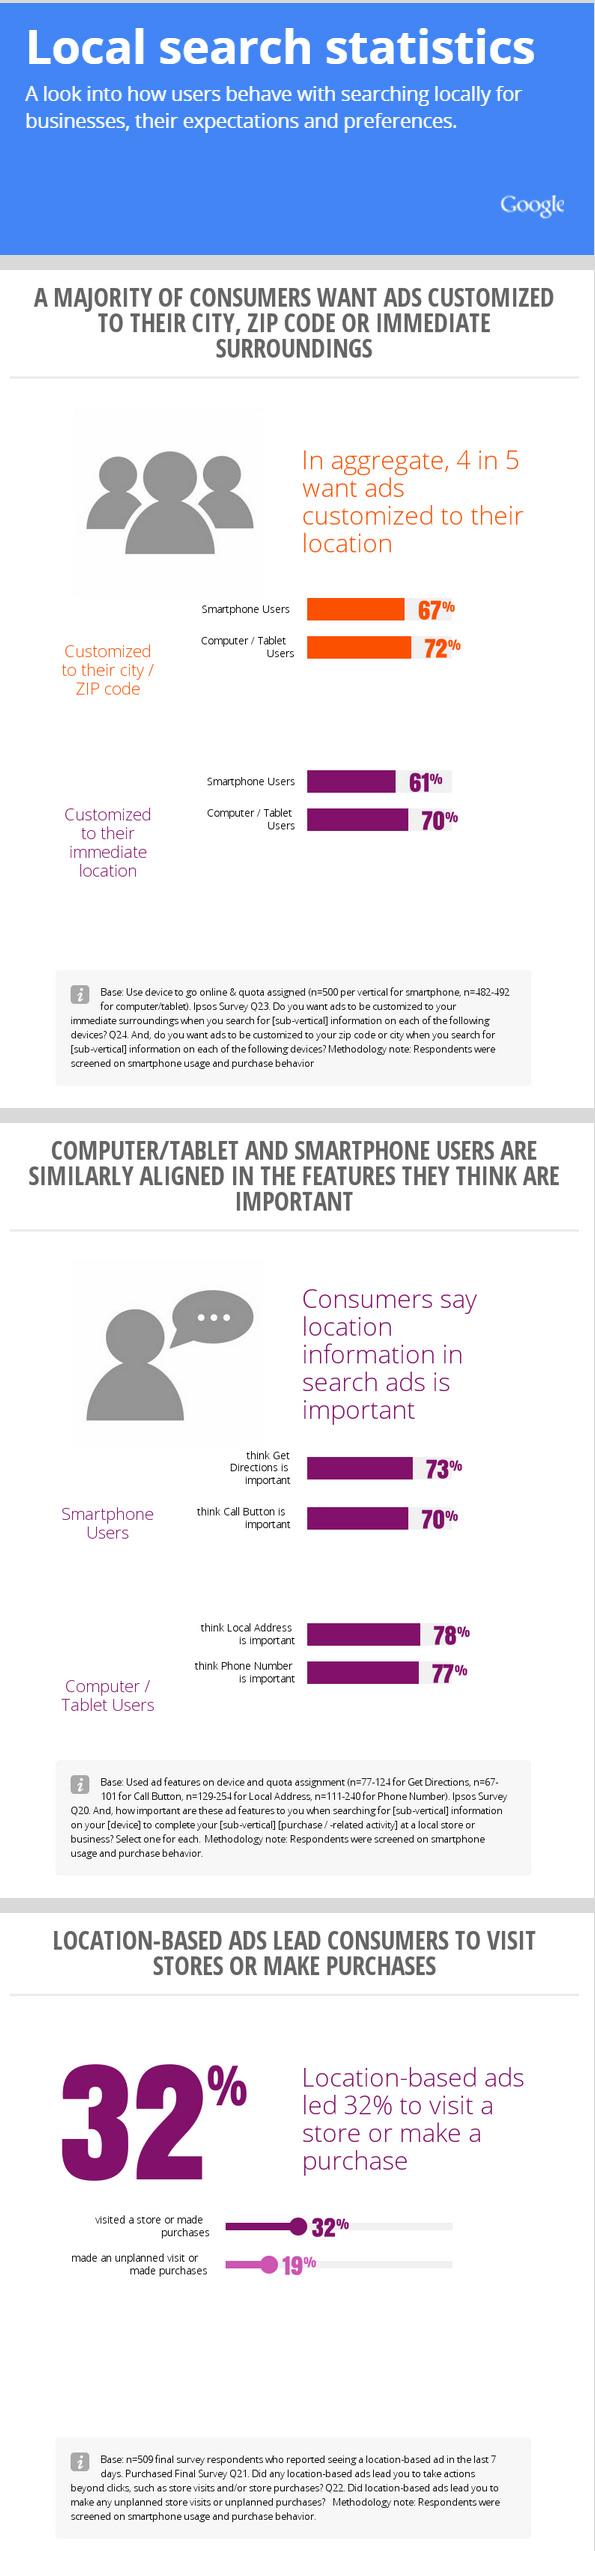 User behaviour in local search